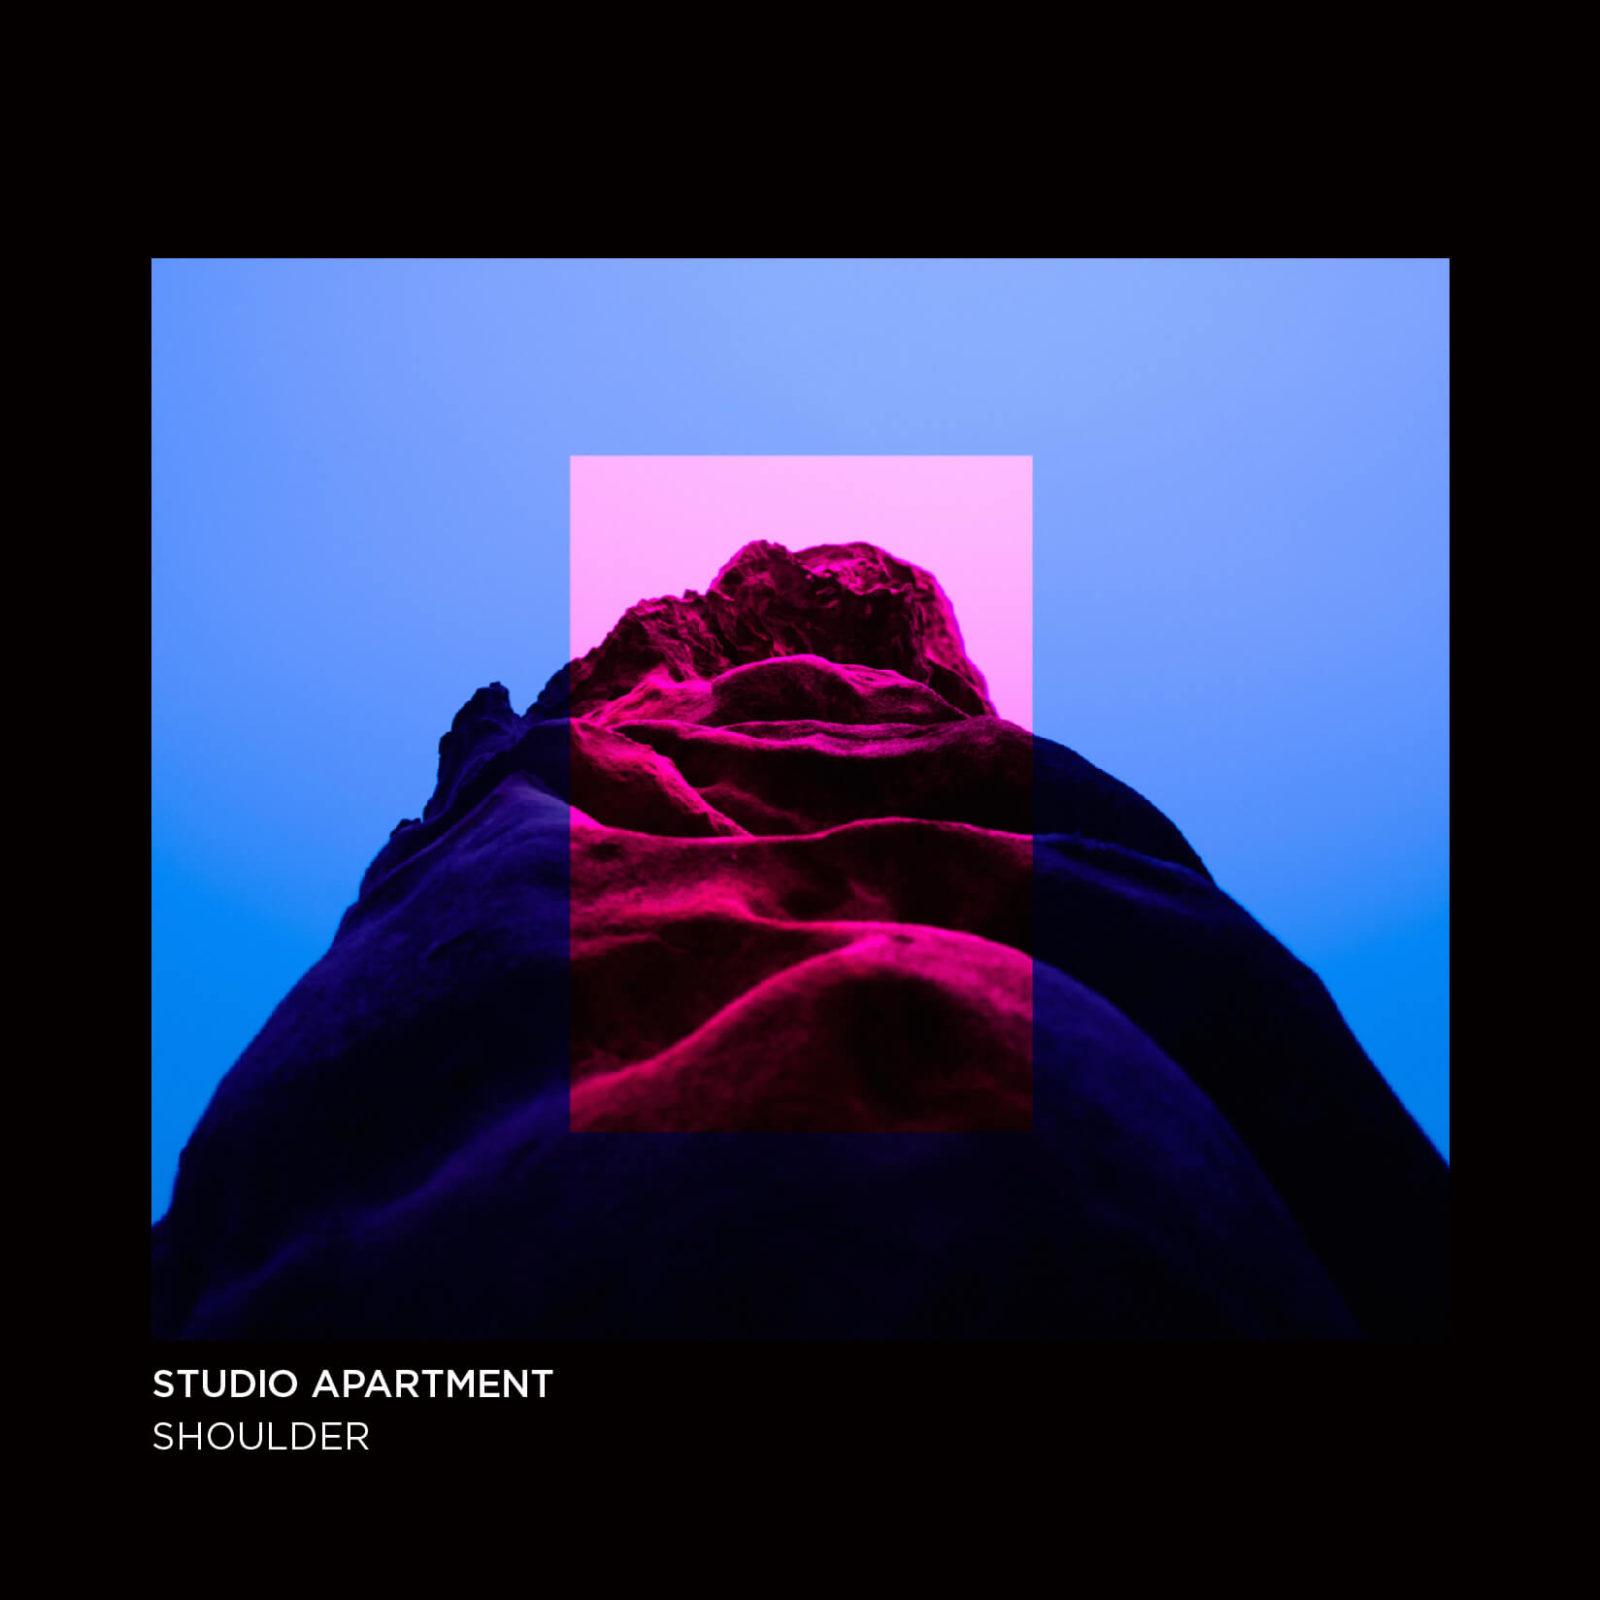 "STUDIO APARTMENT 約6年半ぶりとなる新曲""Shoulder""をリリース!Partyの開催も続々発表サムネイル画像"